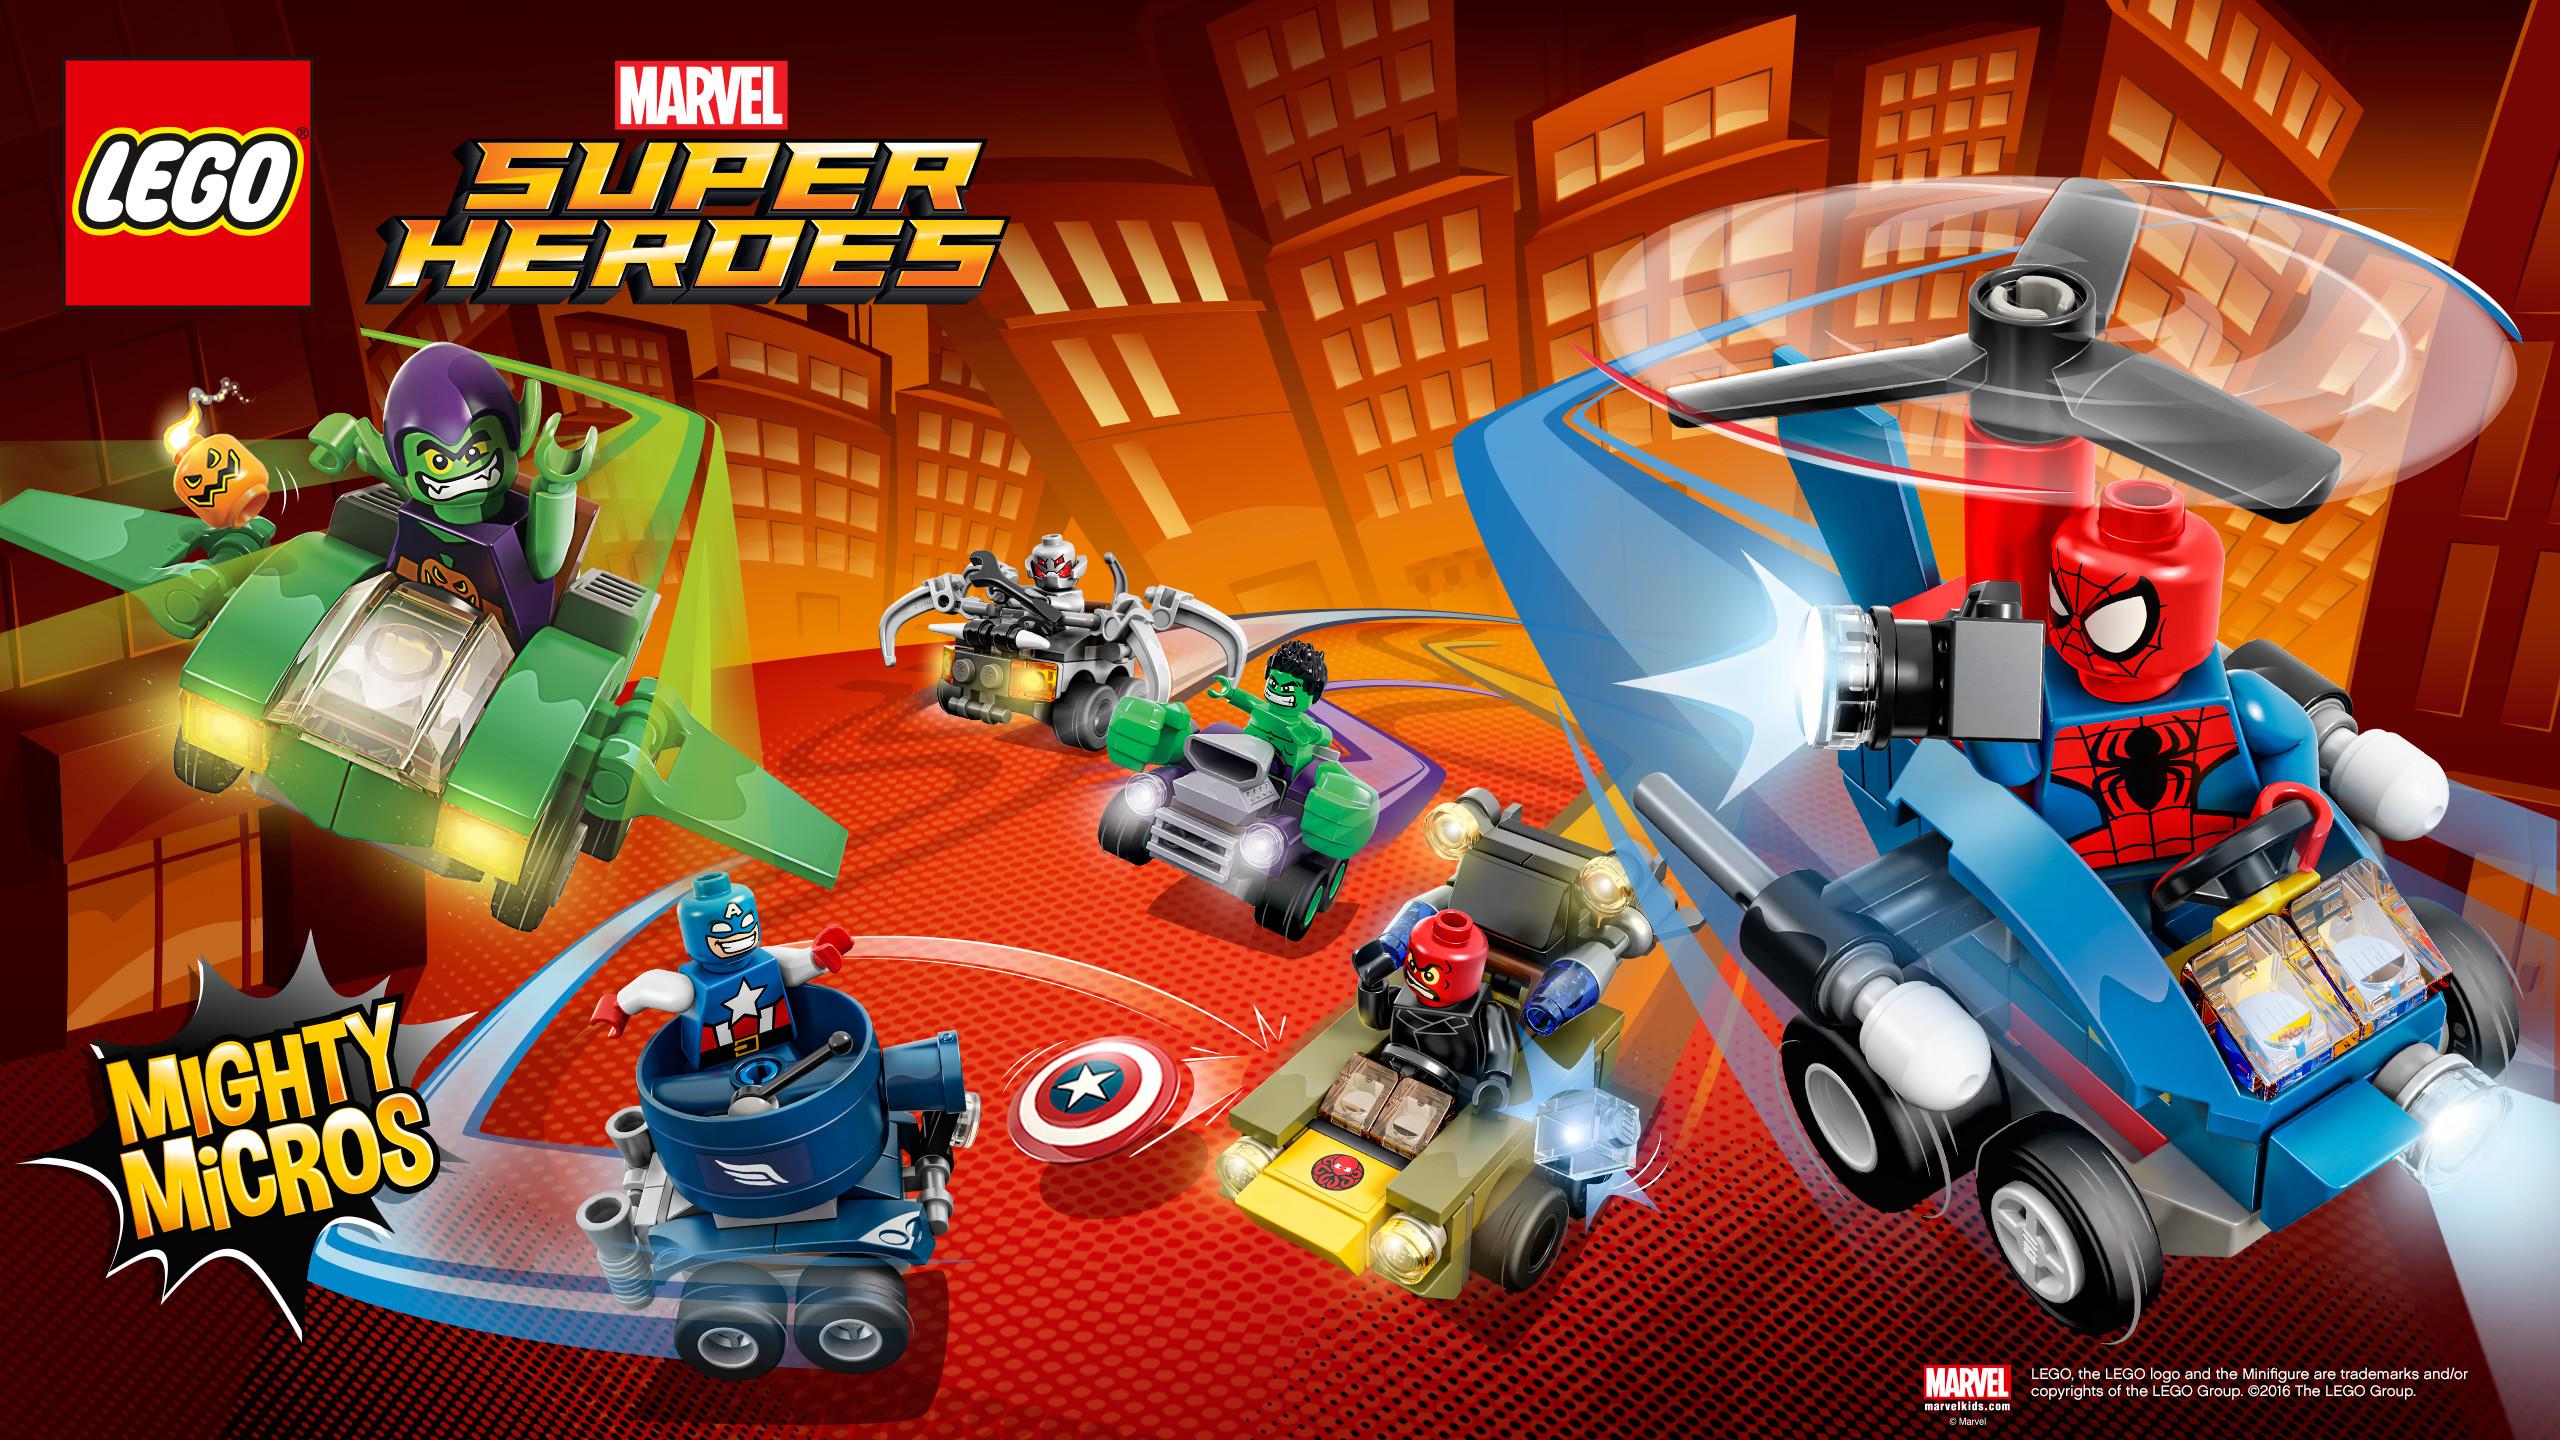 Res: 2560x1440, Marvel Mighty Micros. Brainiac Attack Wallpaper